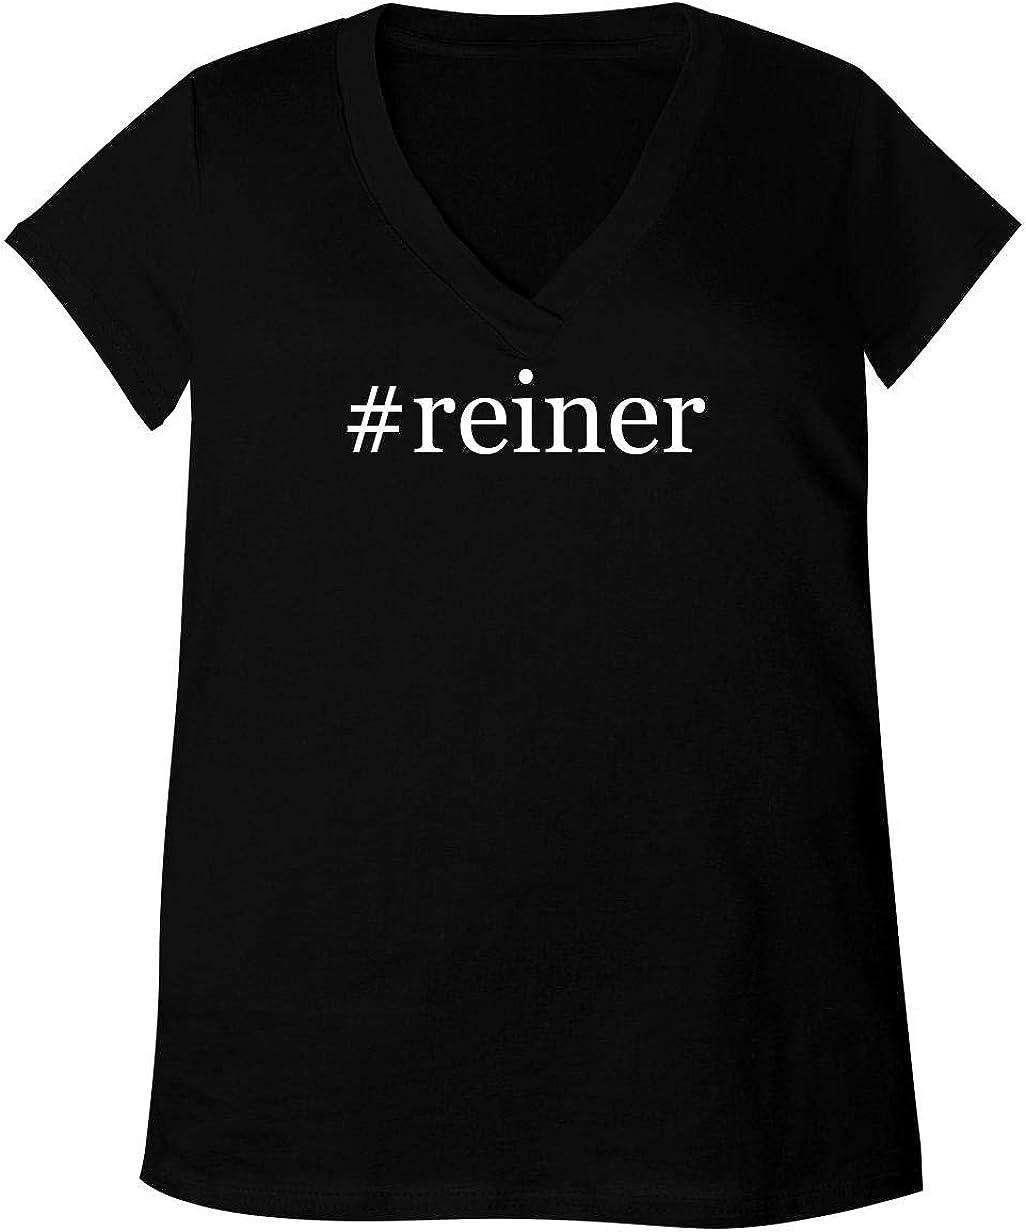 #Reiner - Adult Bella + Canvas B6035 Women's V-Neck T-Shirt 51QzxN4v5GL